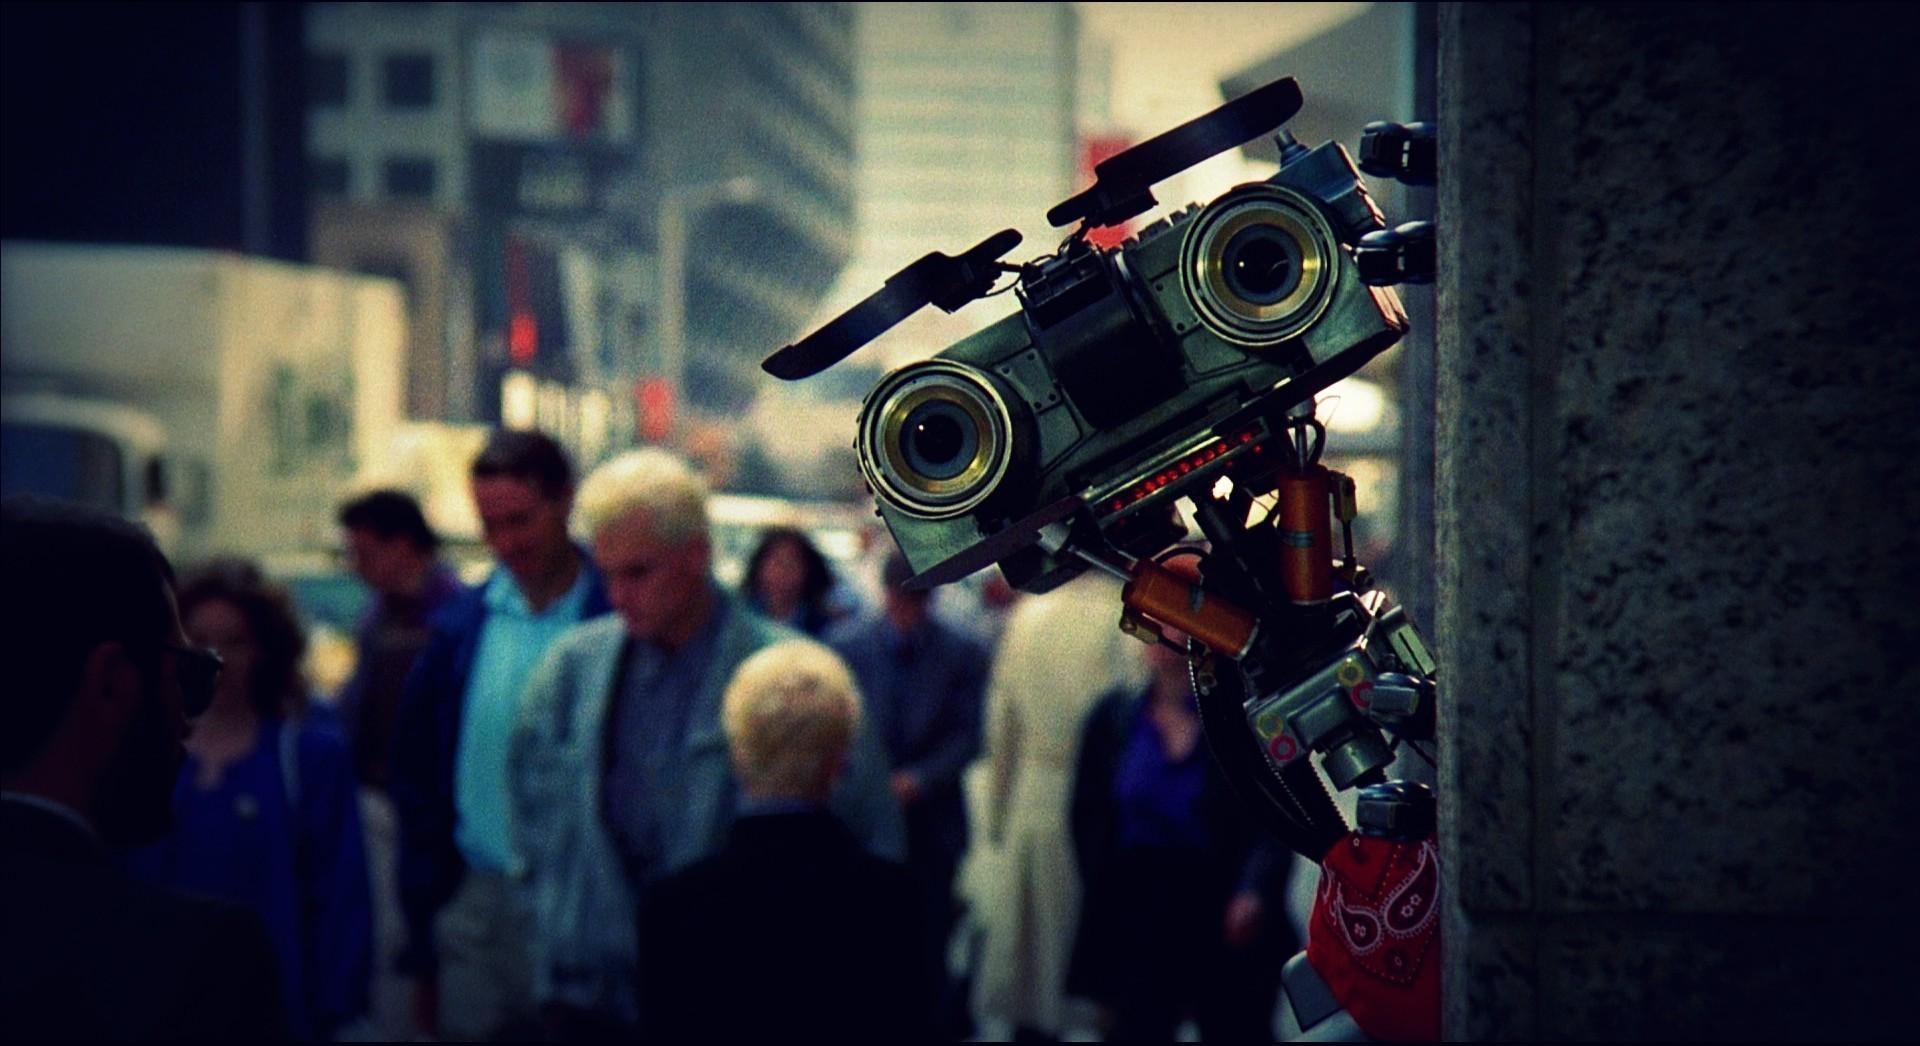 1920x1046 Px Johnny 5 Life Movies New York City Robot Short Circuit TV